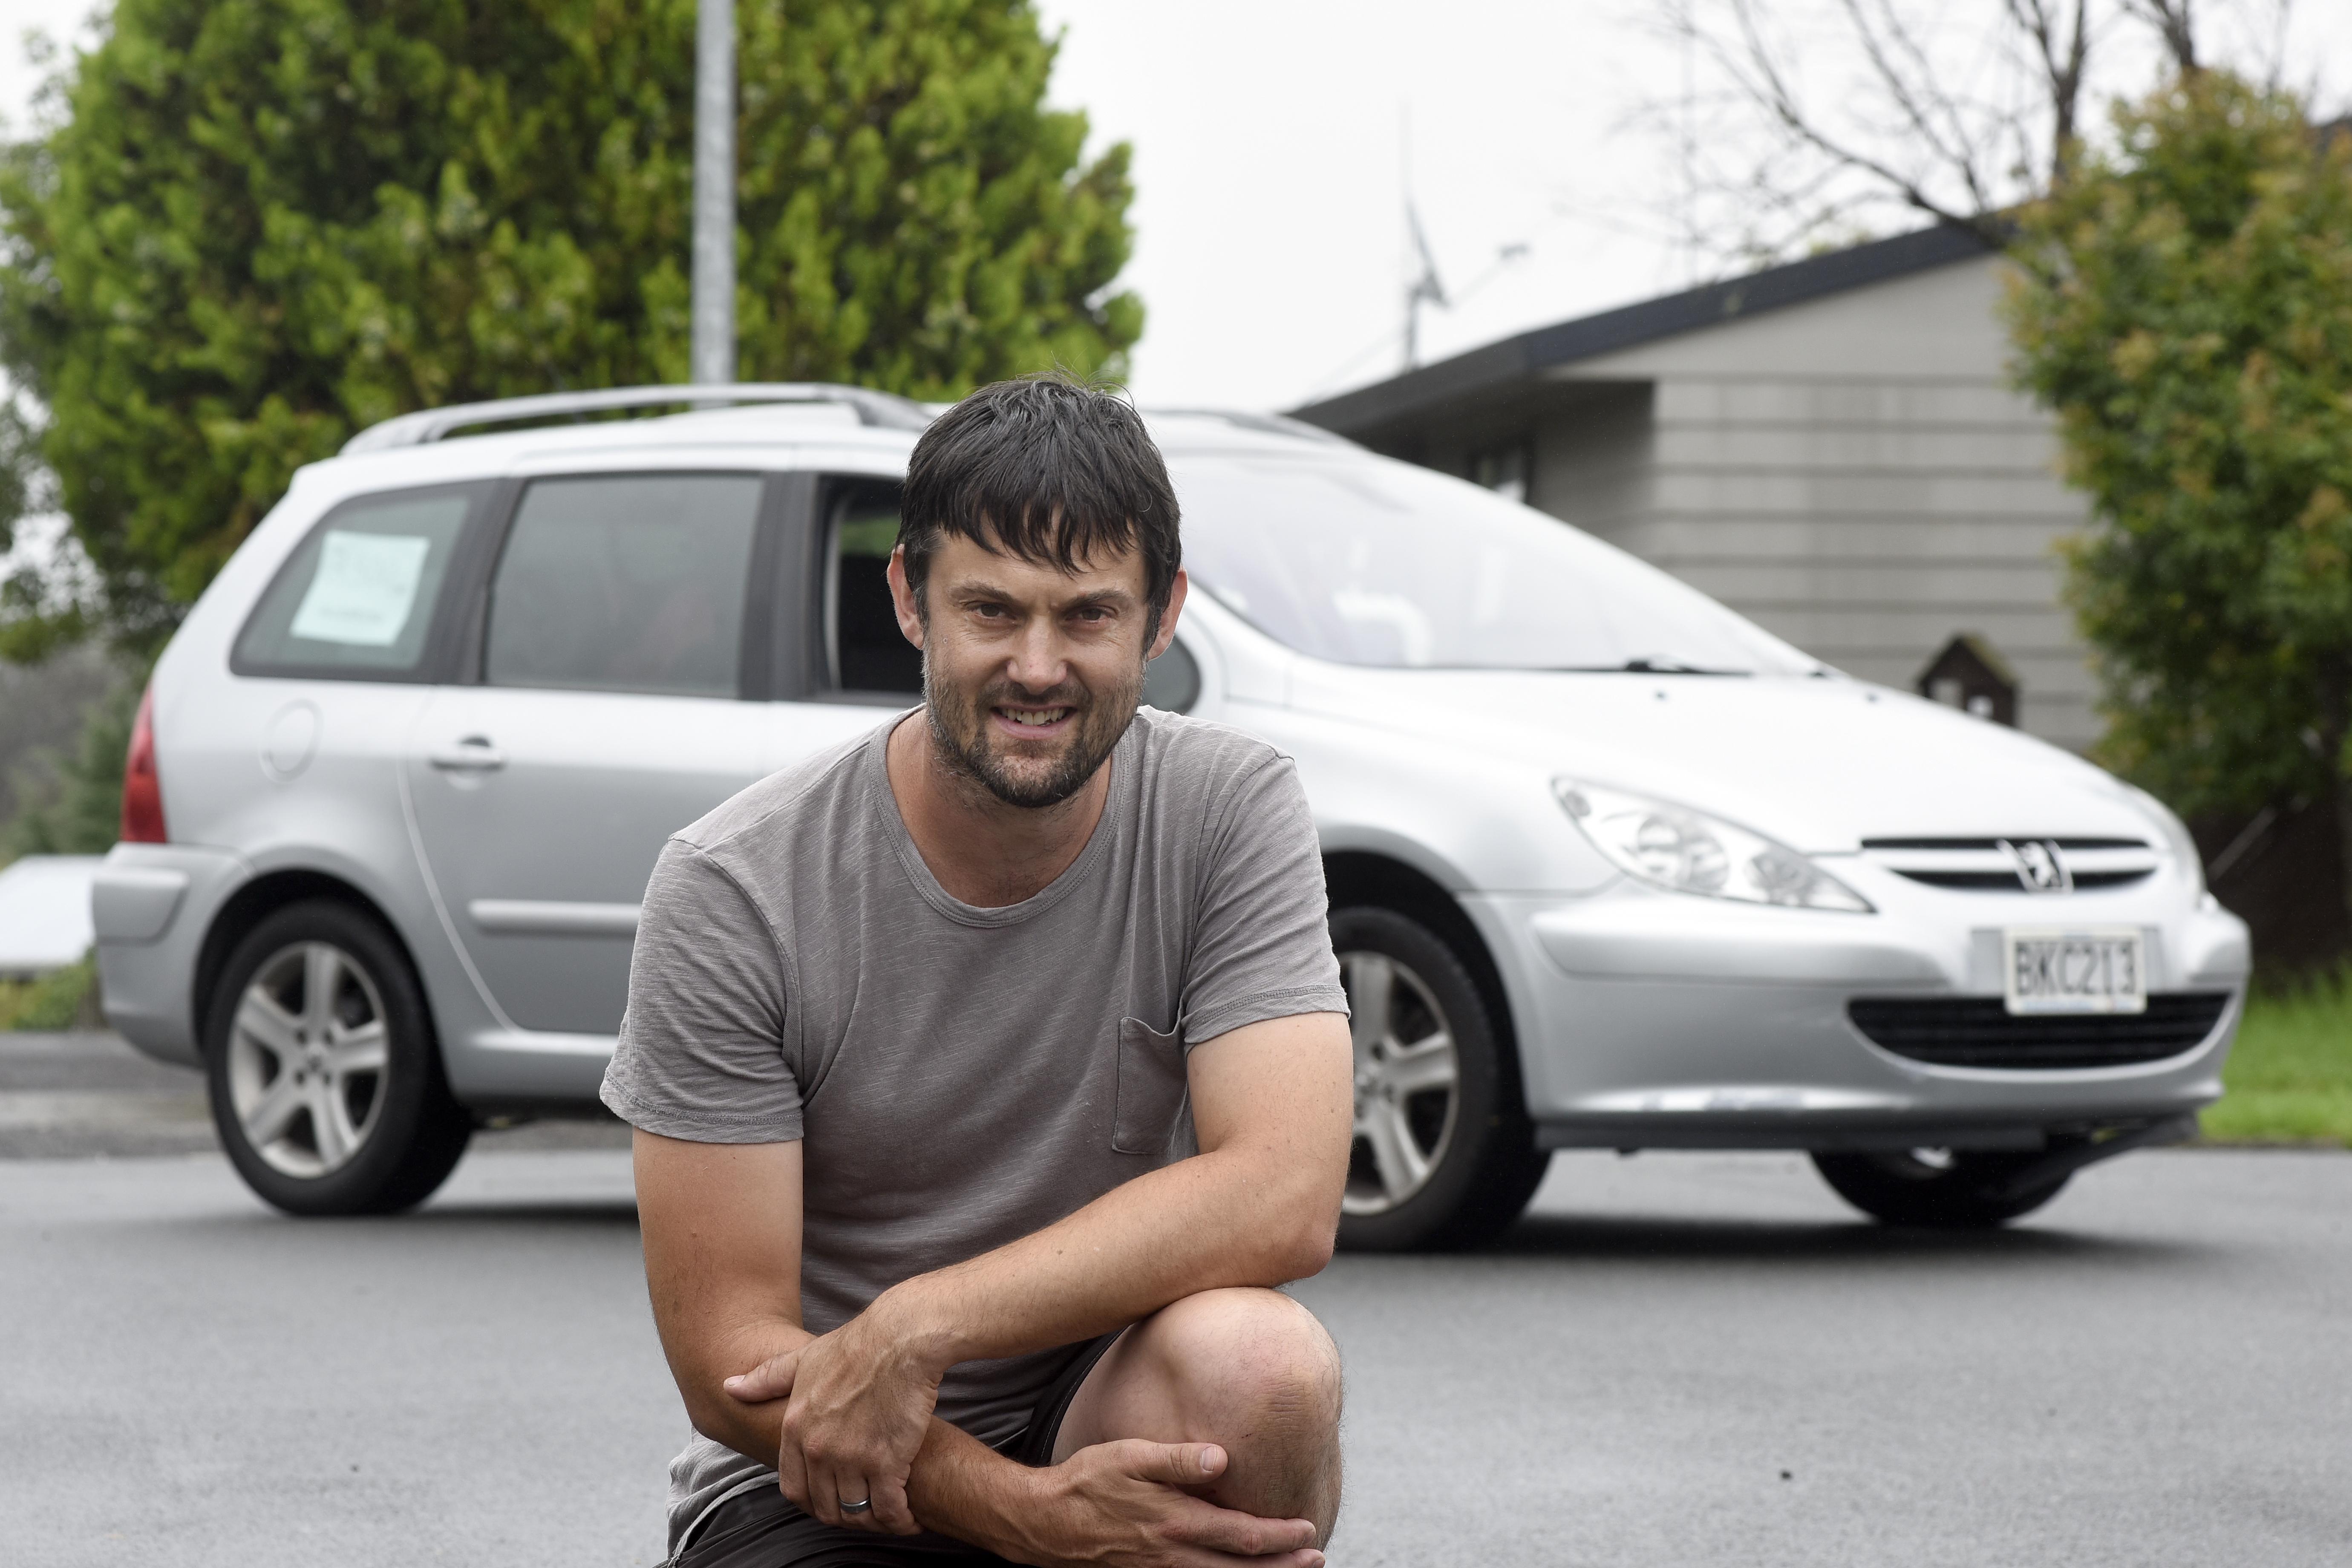 Car pooling popularity on rise with Tauranga motorists - NZ